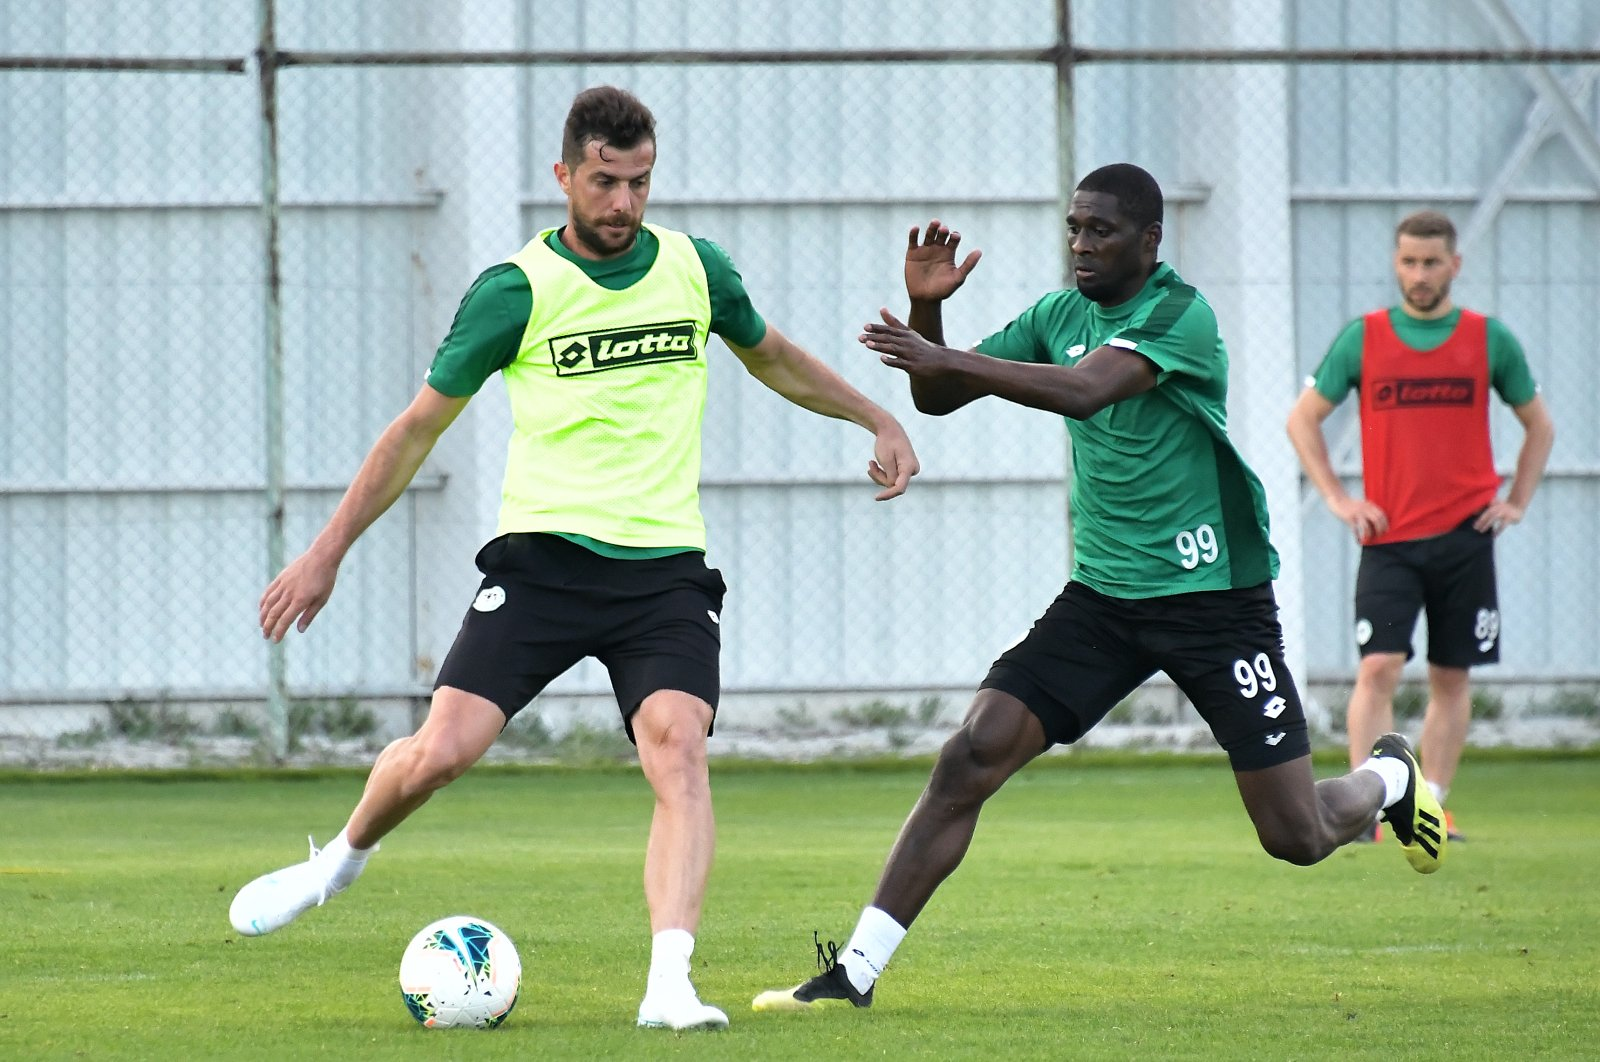 Players of Süper Lig's İttifak Holding Konyaspor in a training session in Konya, Turkey, June 11, 2020. (AA Photo)